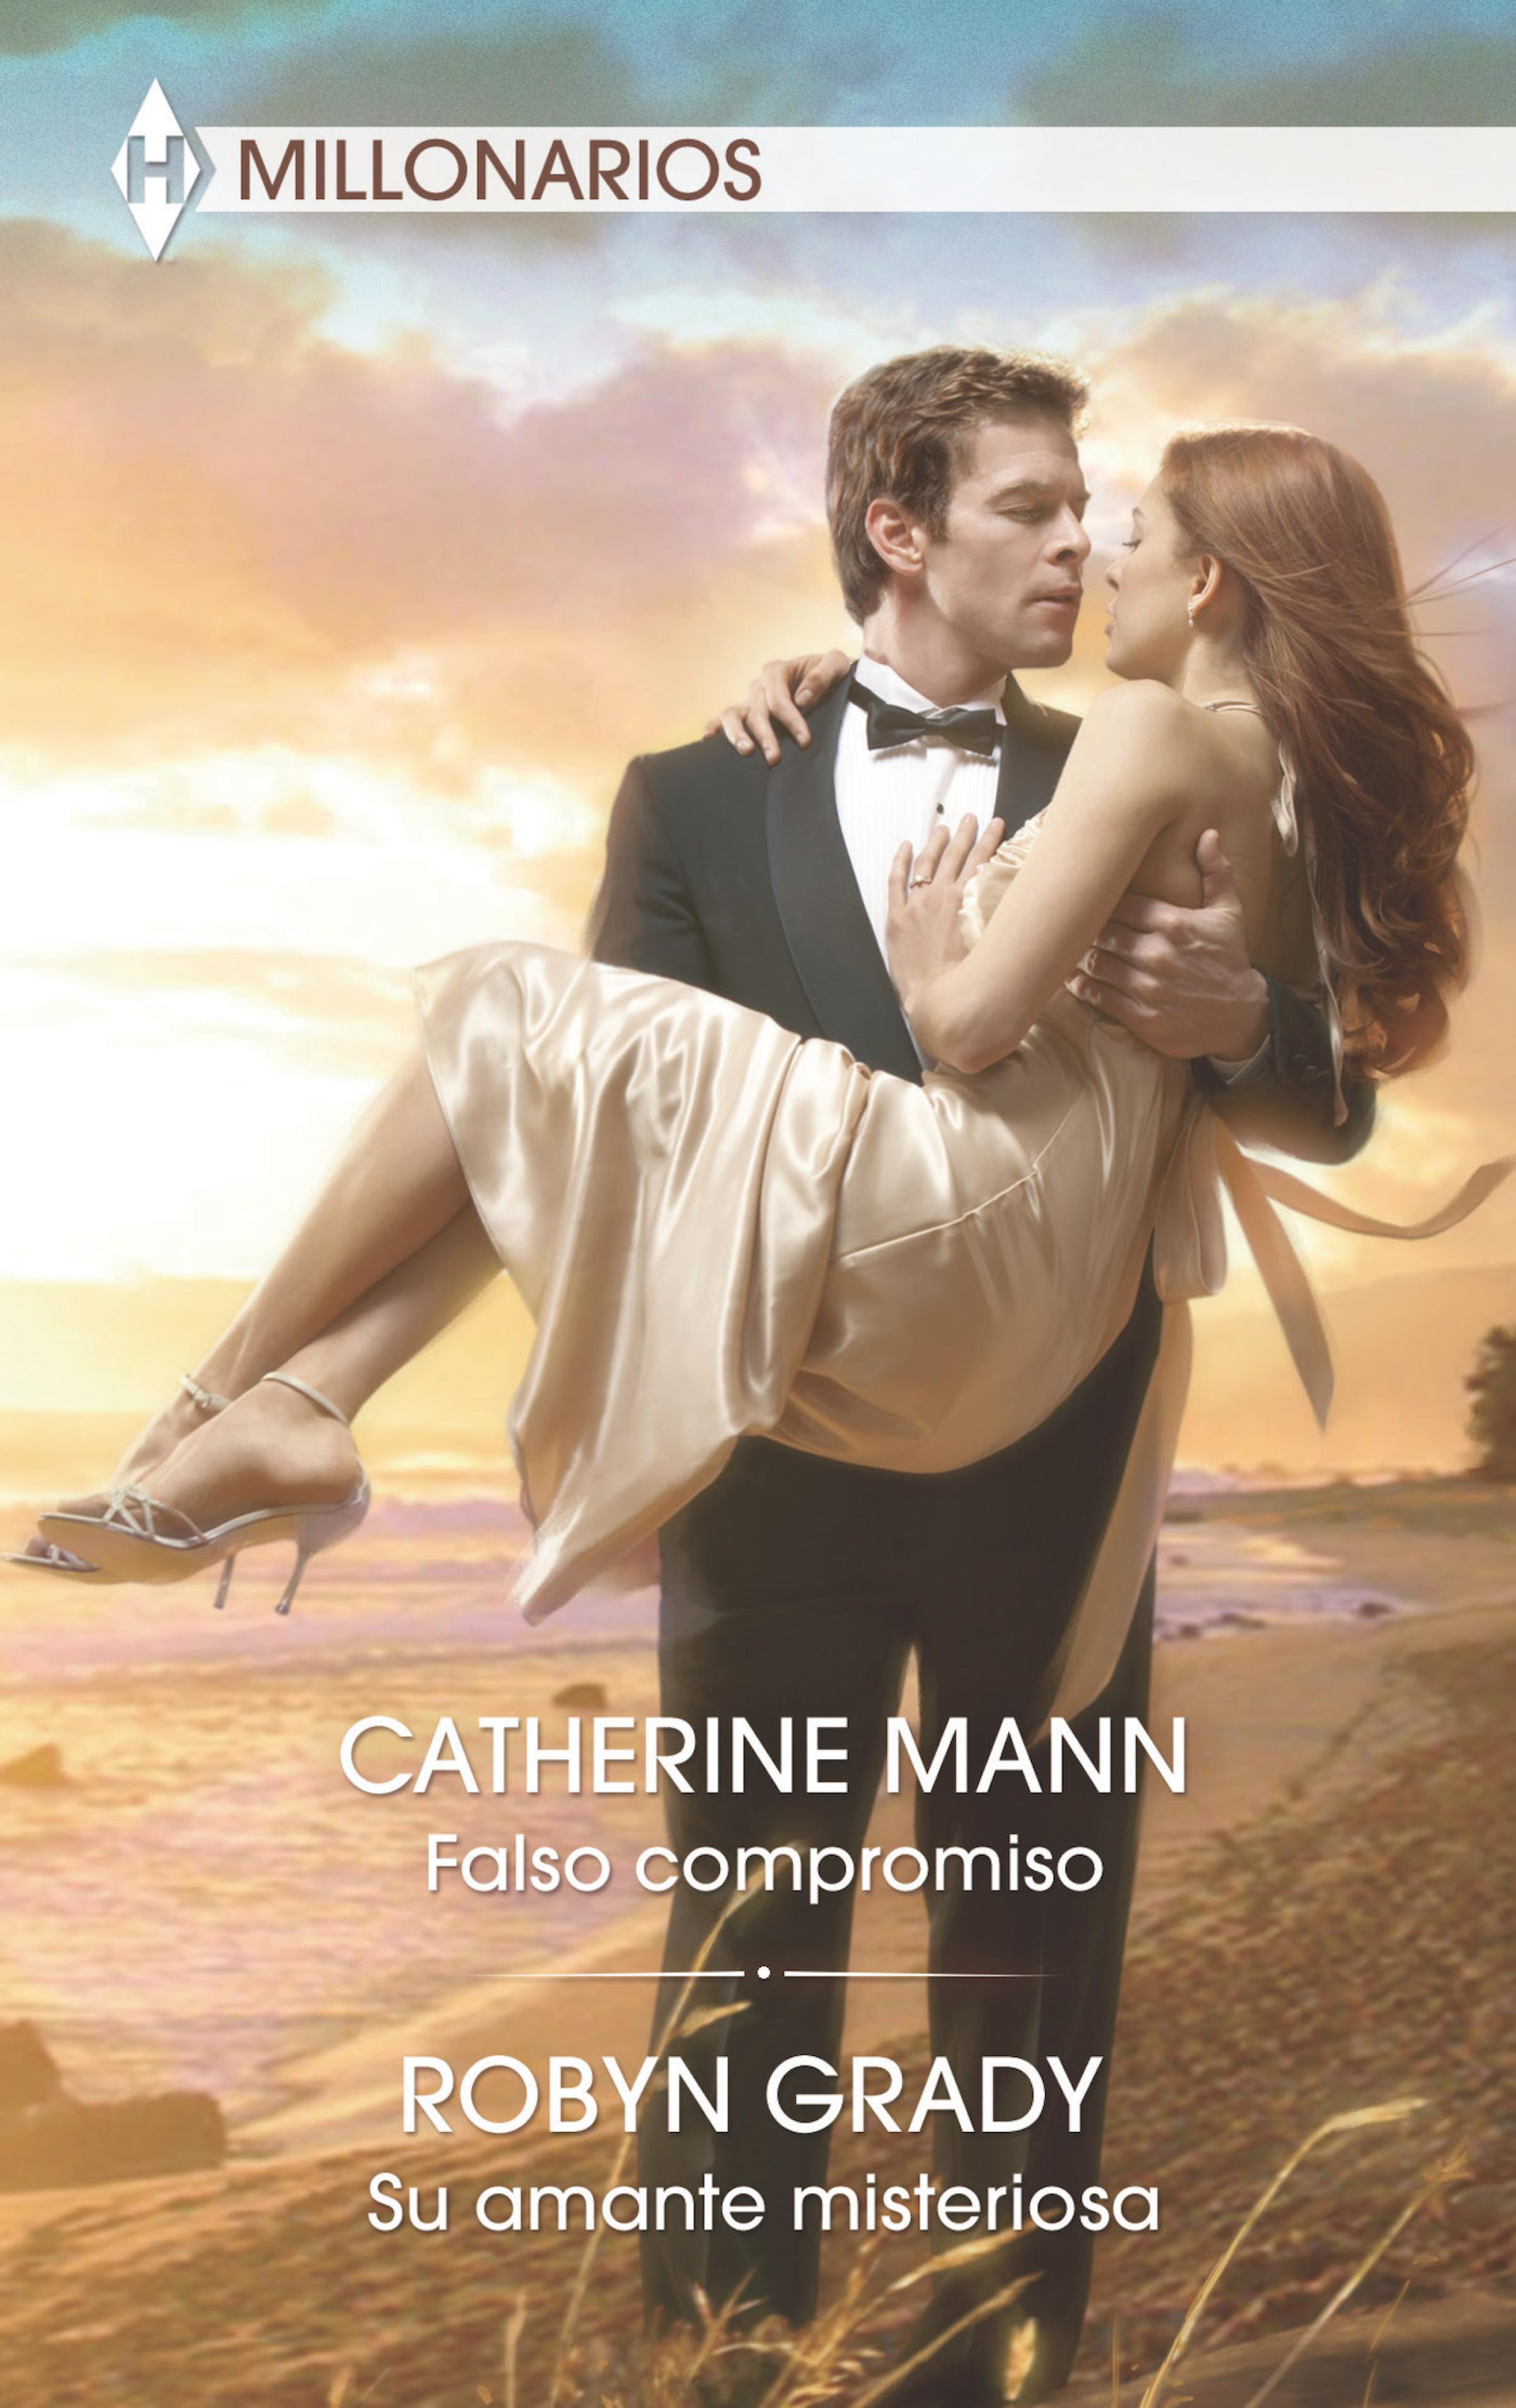 Robyn Grady Falso compromiso - Su amante misteriosa robyn donald a amante do príncipe